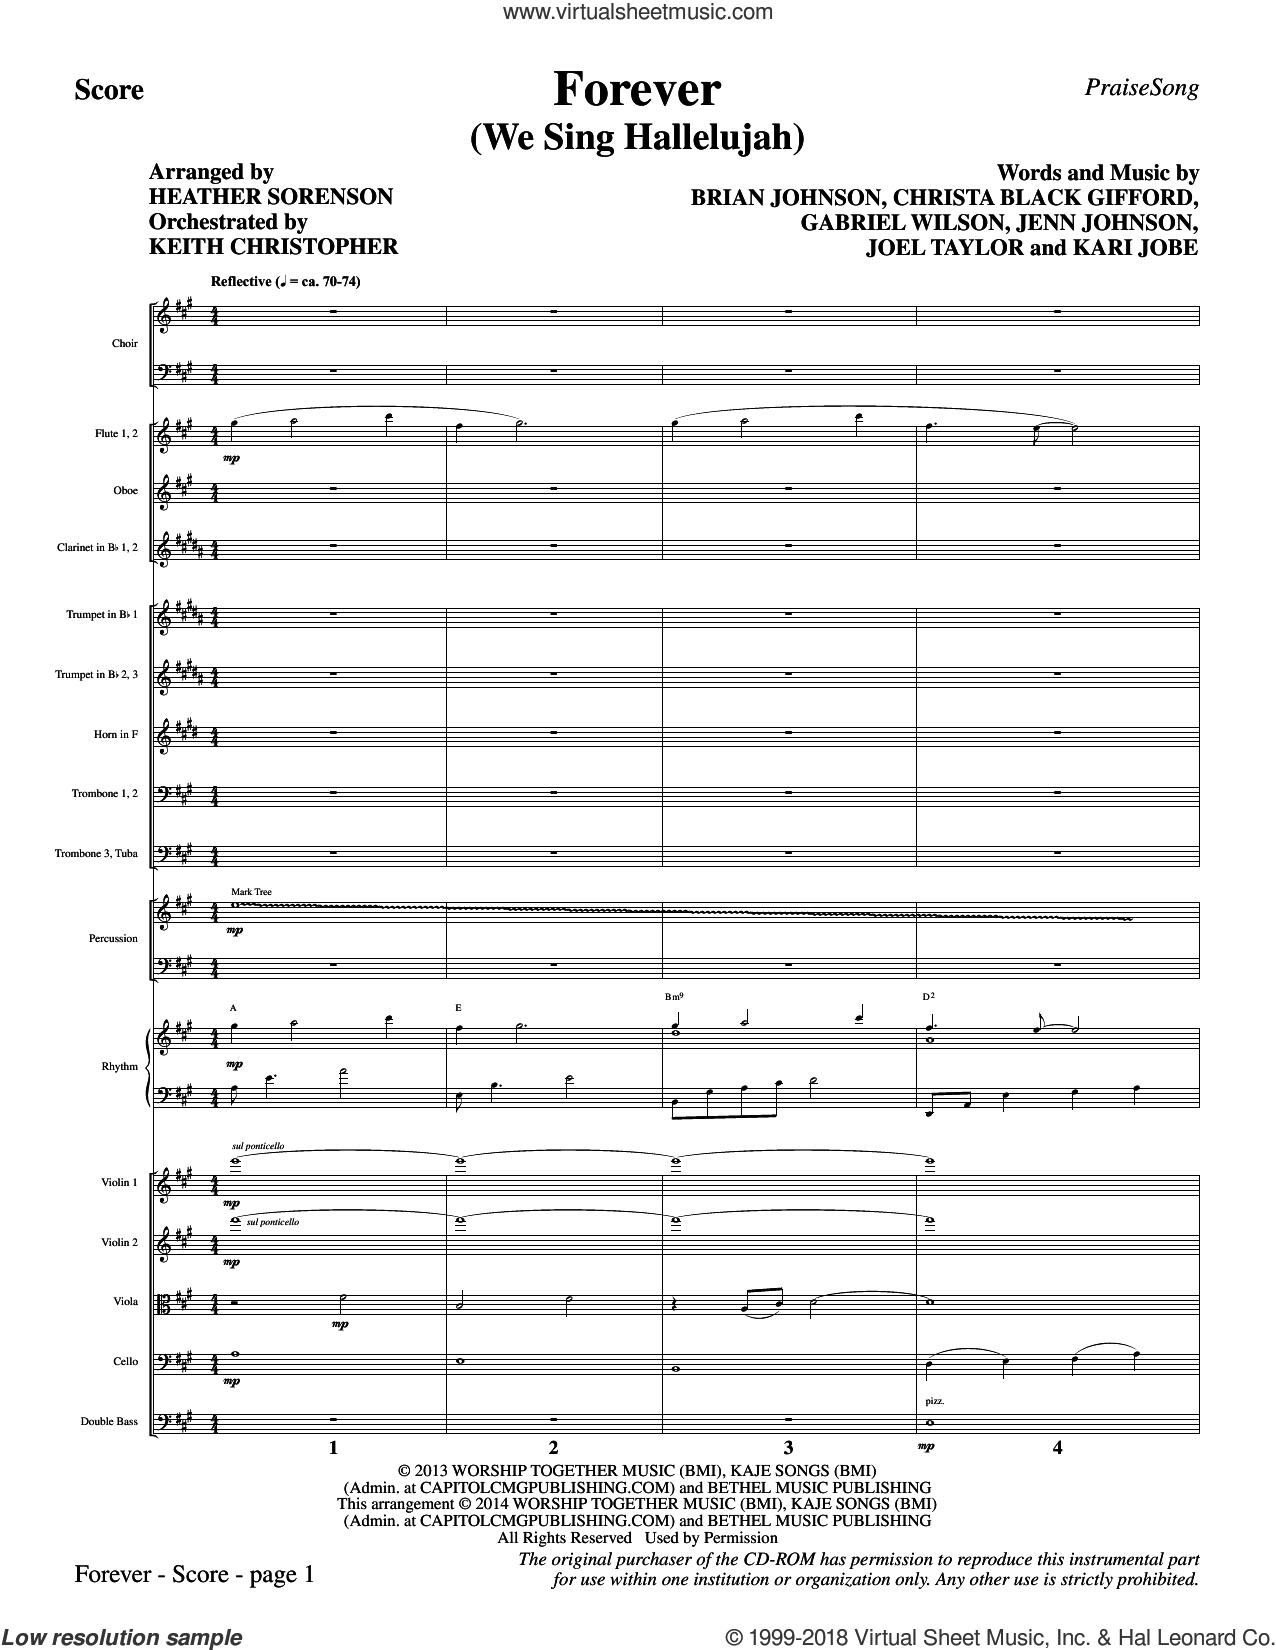 Forever (We Sing Hallelujah) (COMPLETE) sheet music for orchestra/band by Heather Sorenson, Brian Johnson, Christa Black Gifford, Gabriel Wilson, Jenn Johnson, Joel Taylor and Kari Jobe, intermediate skill level